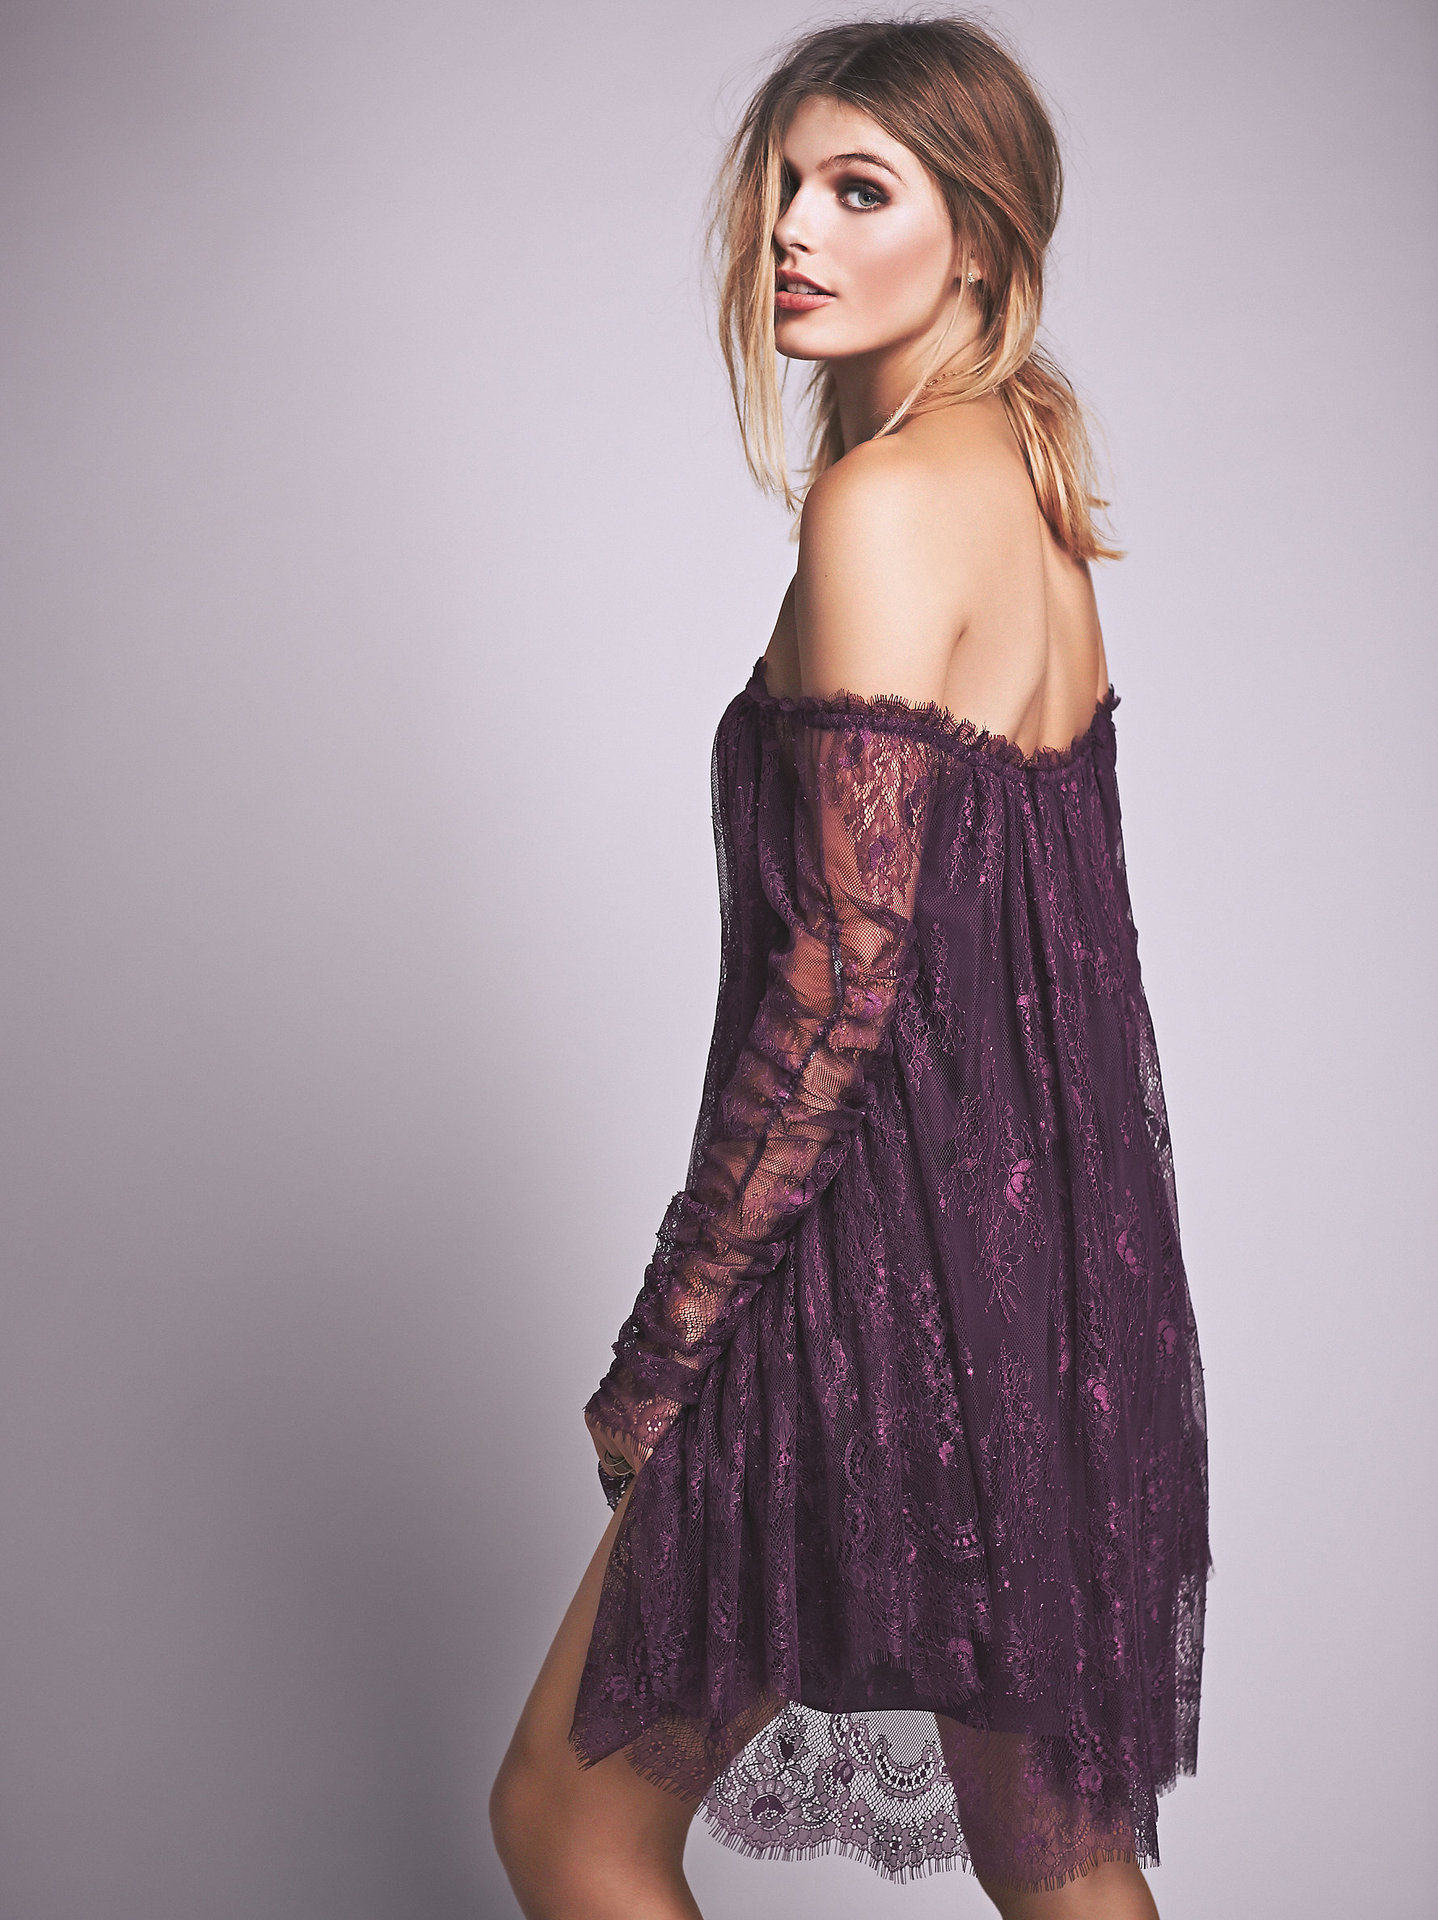 Cute Slash Neck Sexy Mini Lace Dress - Fashion Trendy Shop-2174